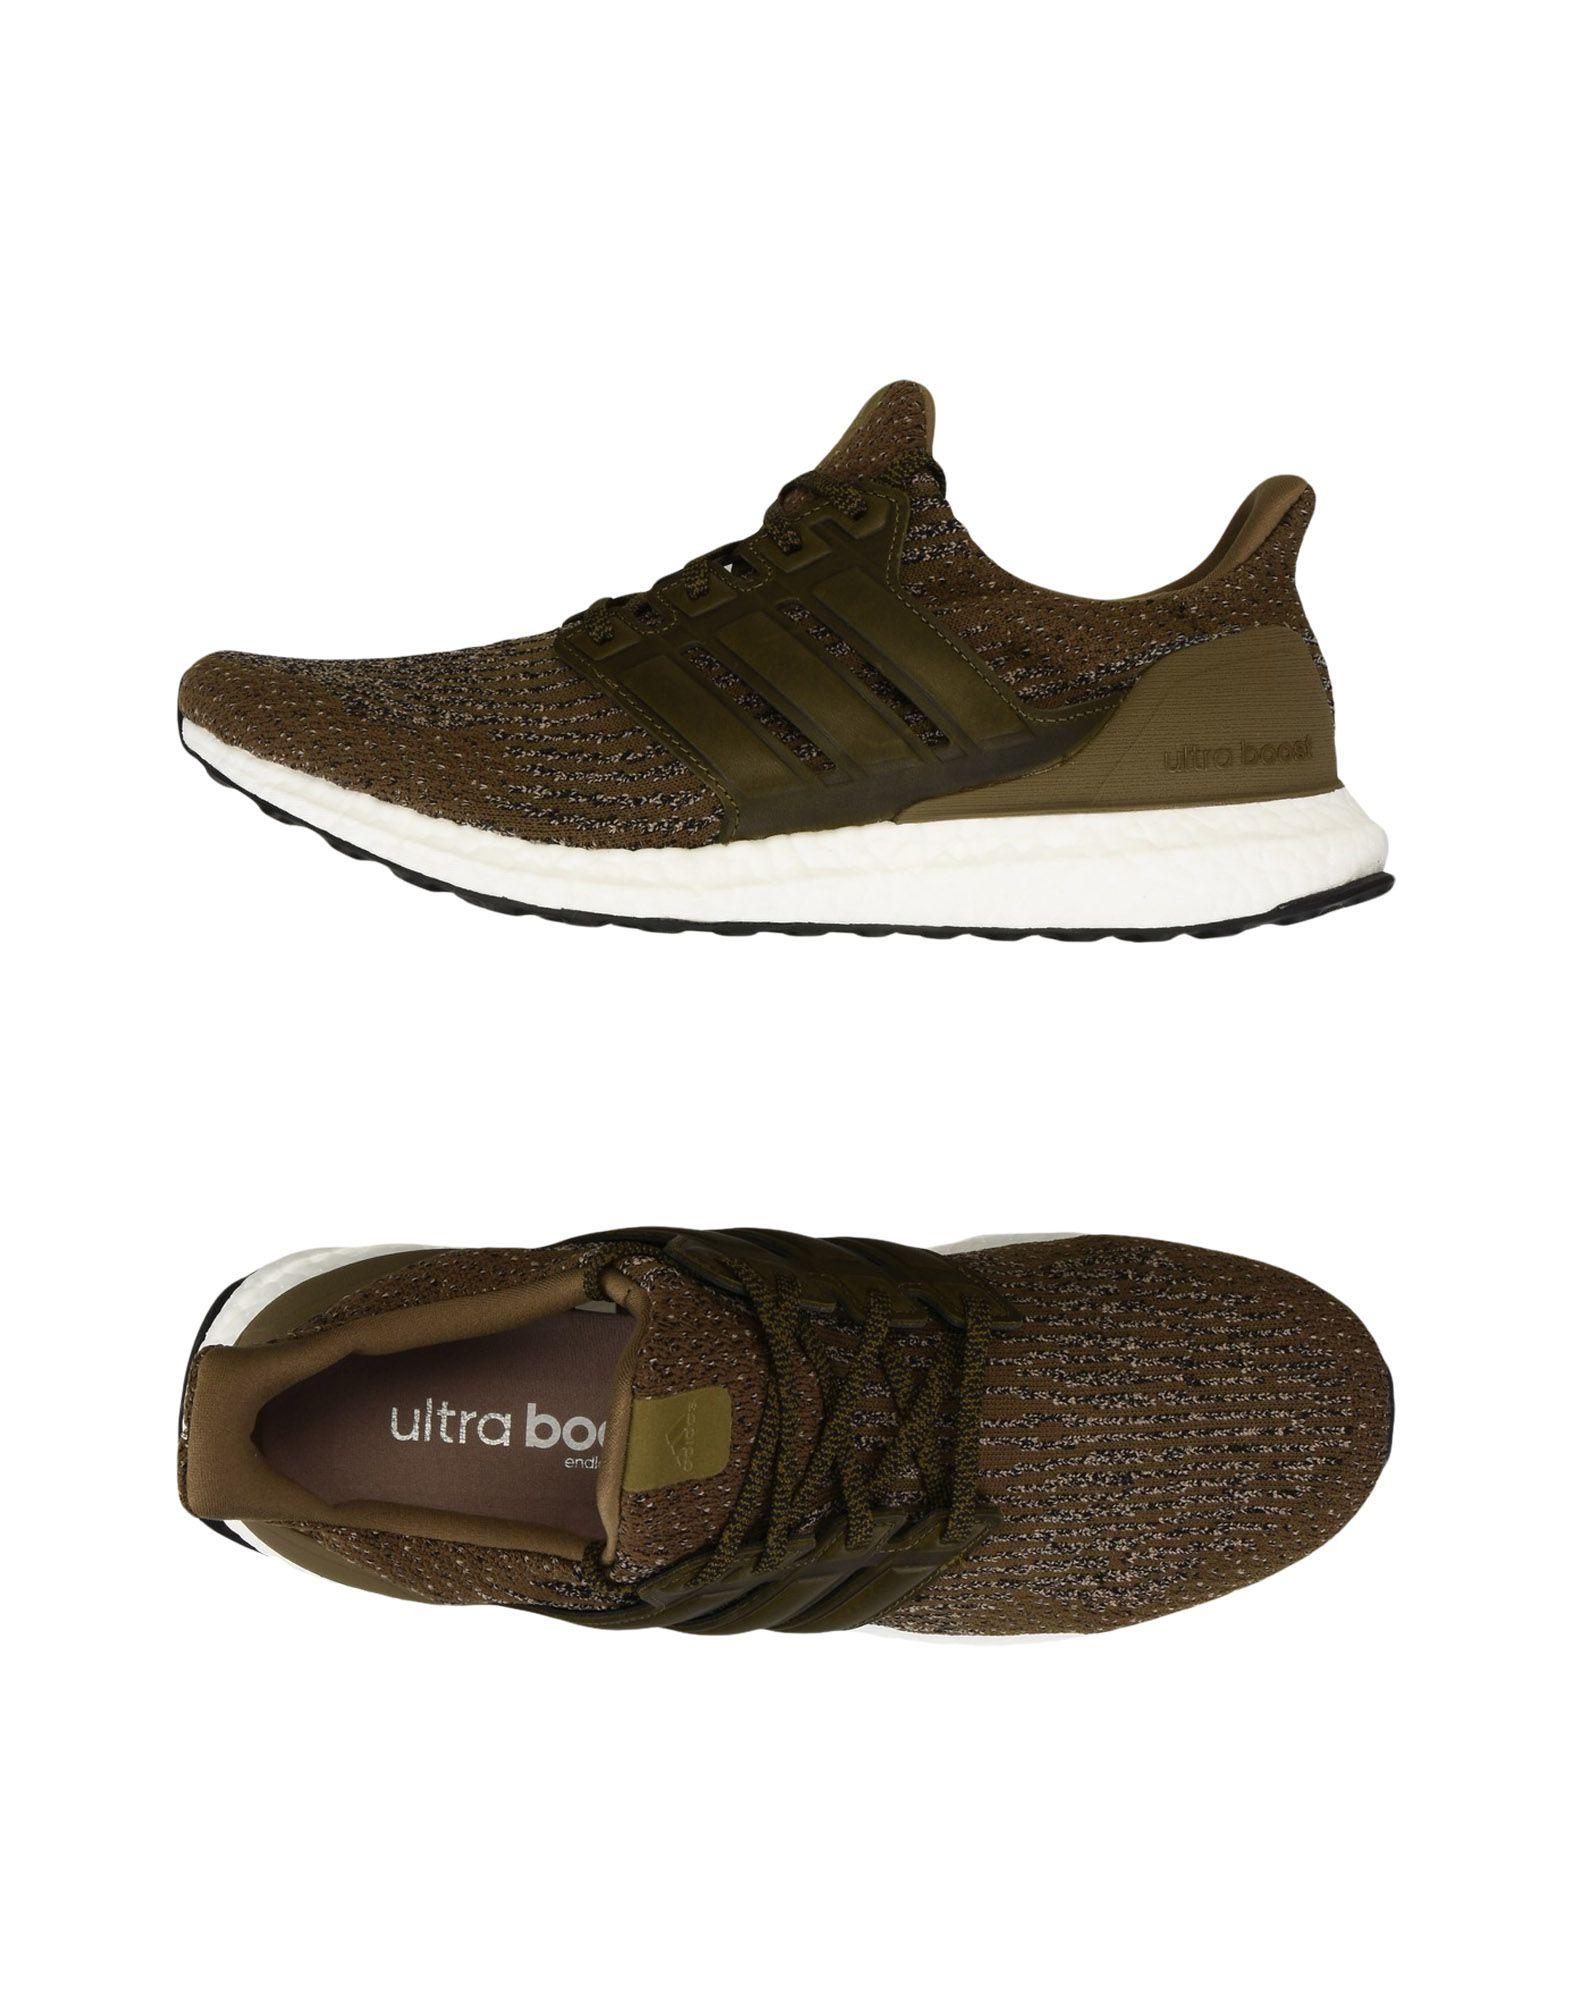 Sneakers Adidas Ultraboost - Uomo - 11325742DA